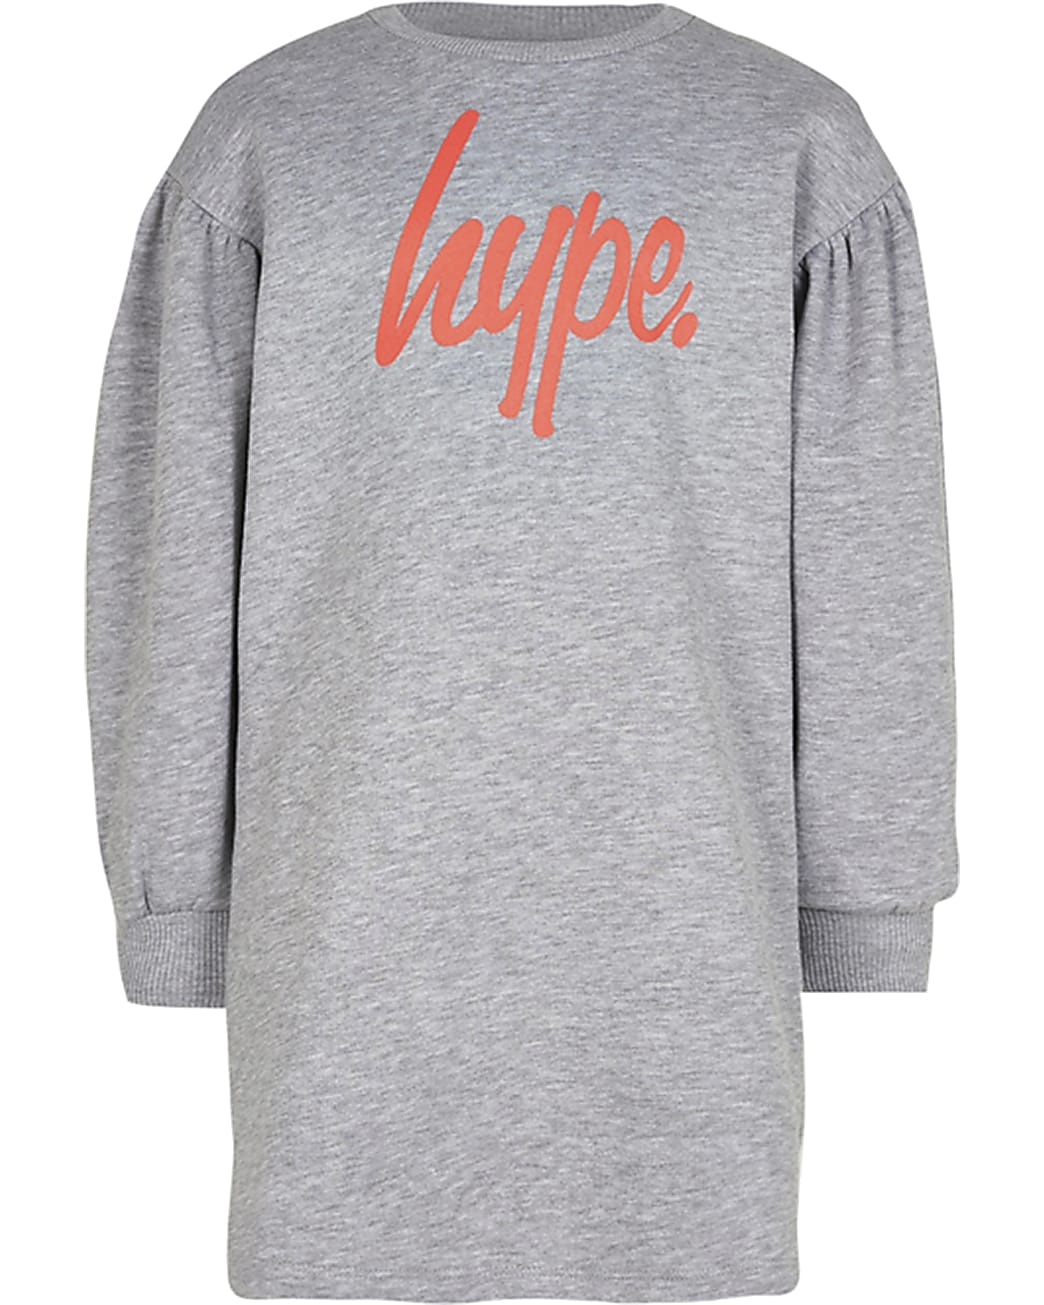 Grey Hype sweat dress